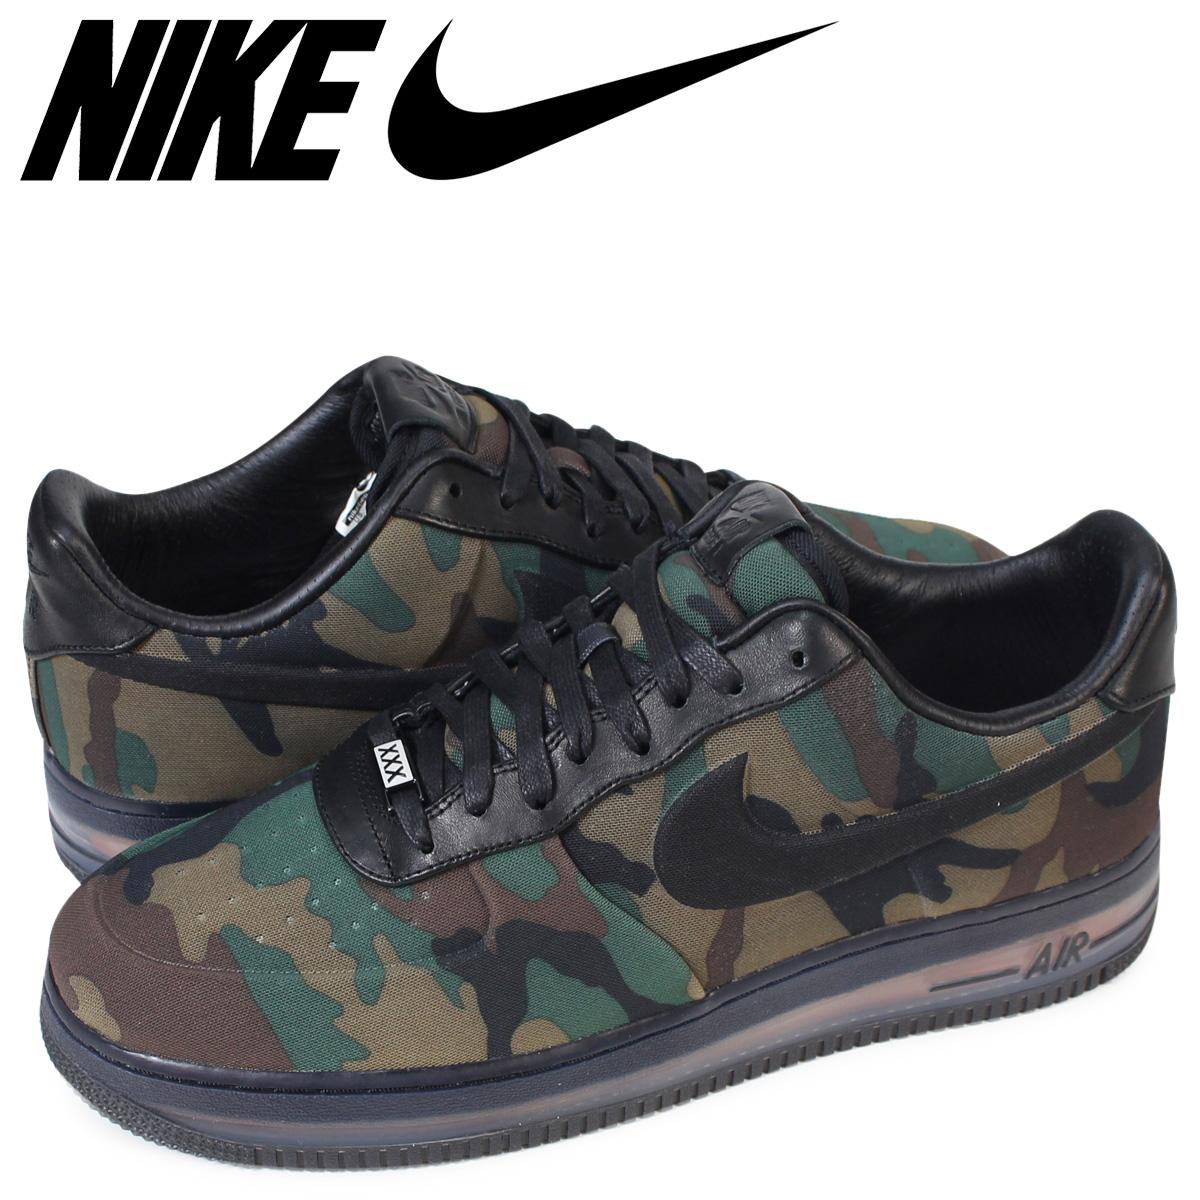 sports shoes 74c42 8718e Nike NIKE air force 1 sneakers AIR FORCE 1 LOW MAX AIR VT QS CAMO  ...